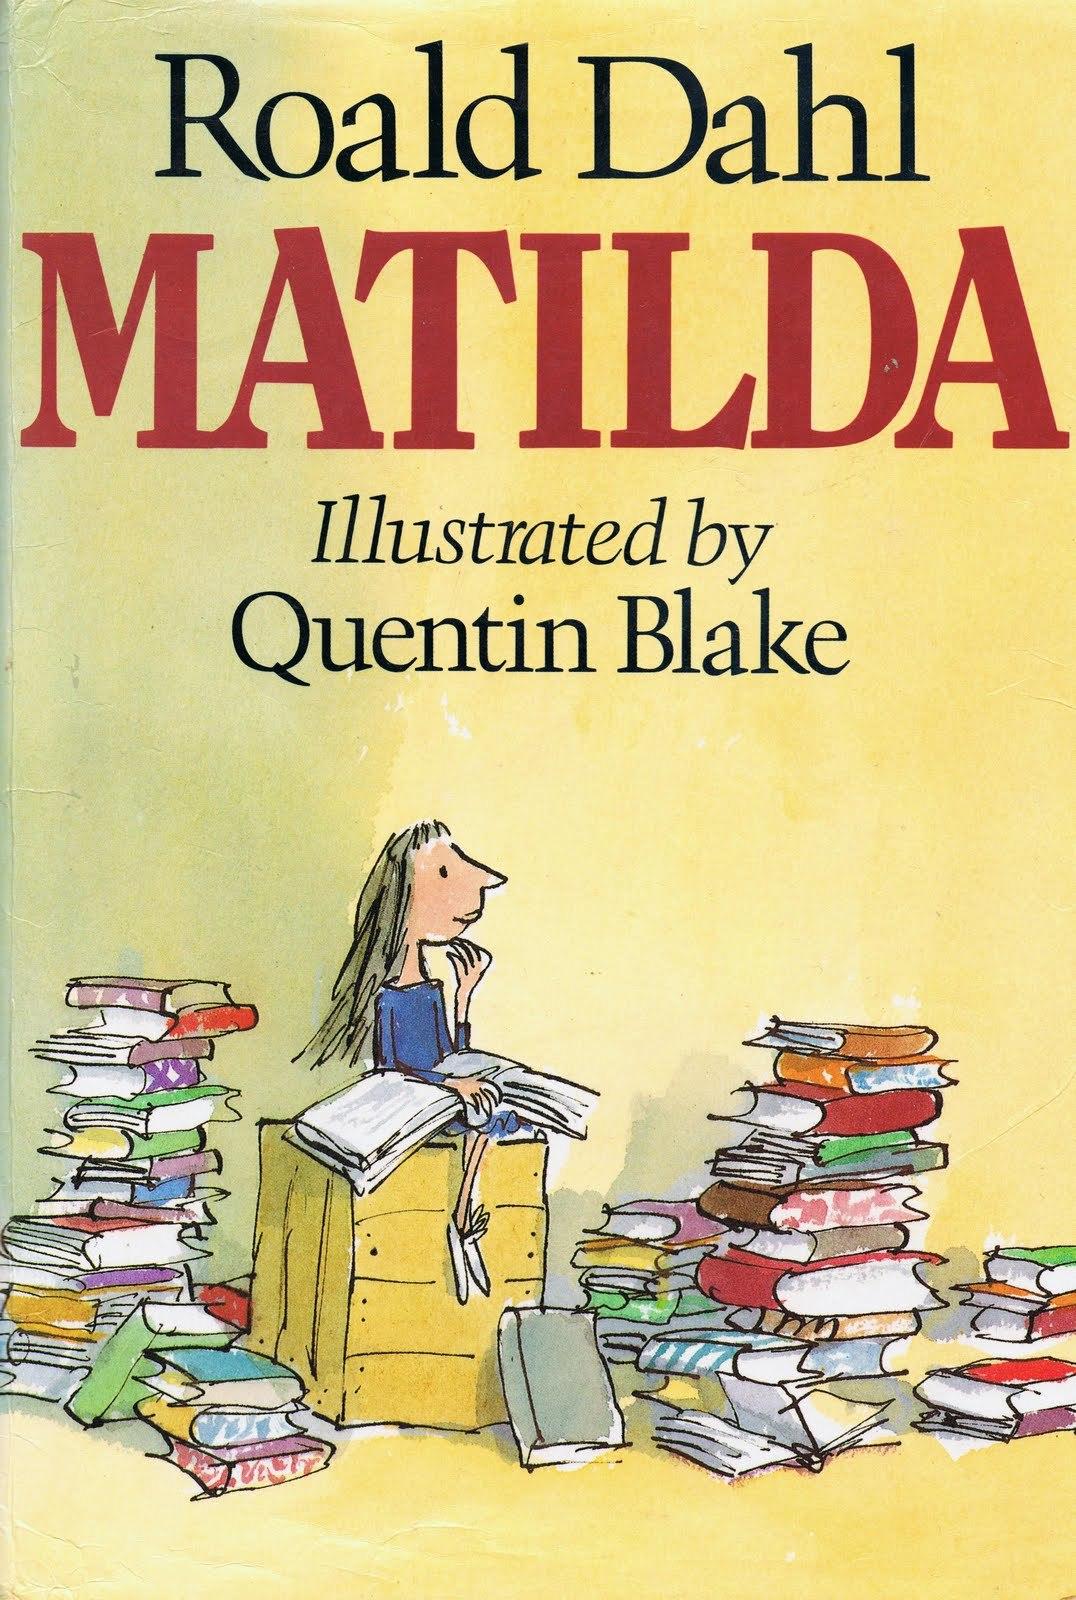 The Best Roald Dahl Books For Kids Including Matilda And The Bfg